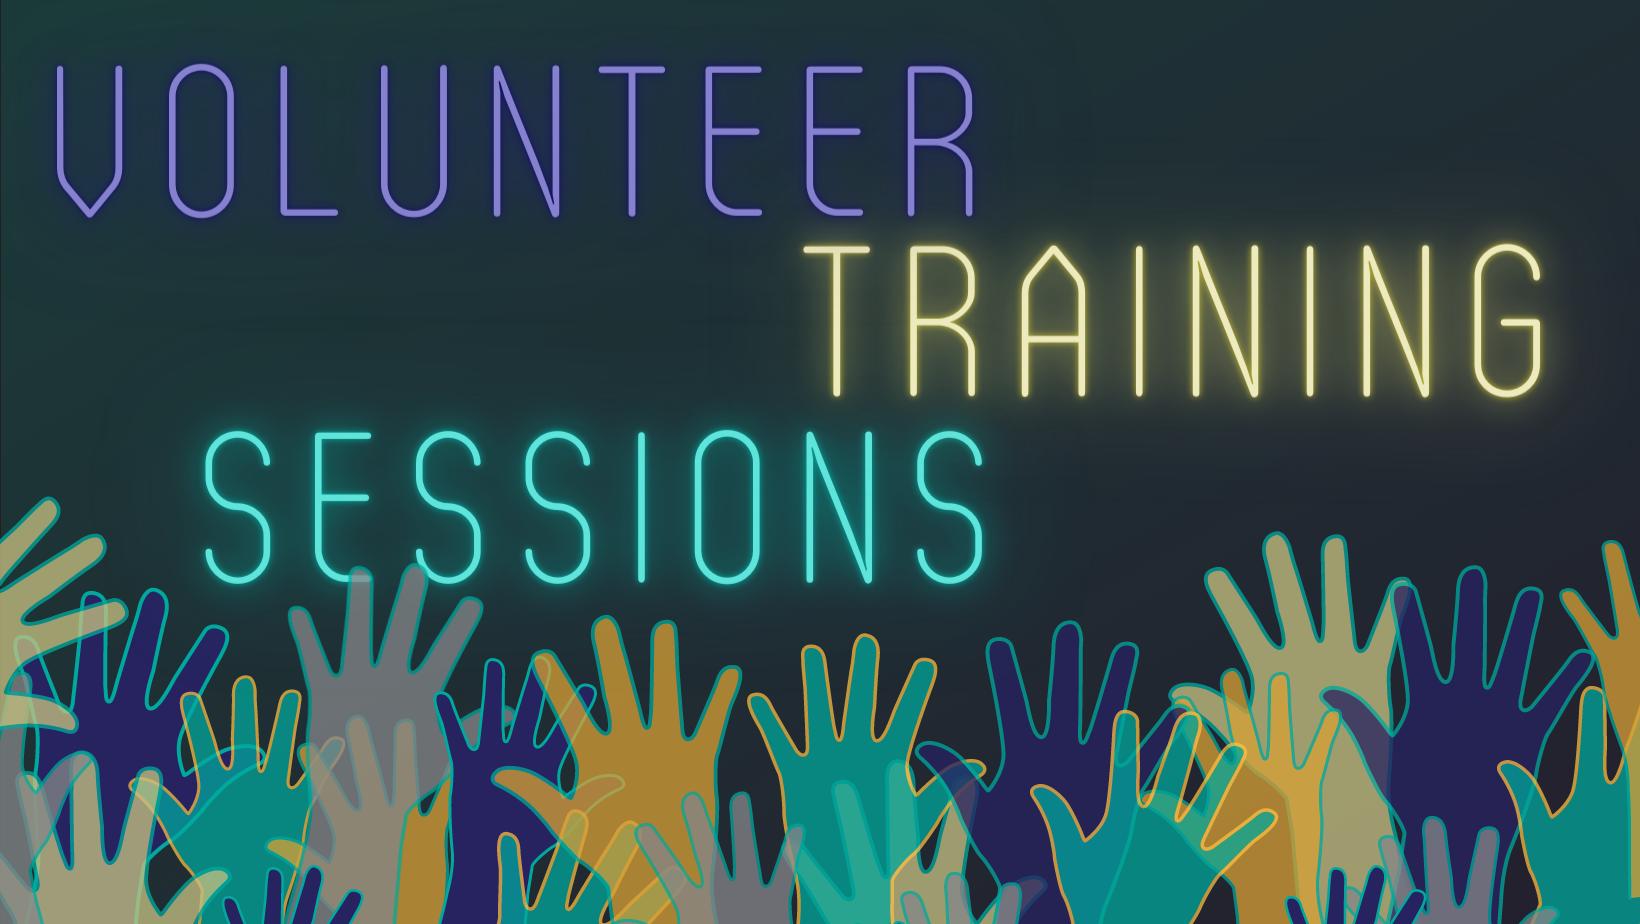 Volunteer Training Sessions Image